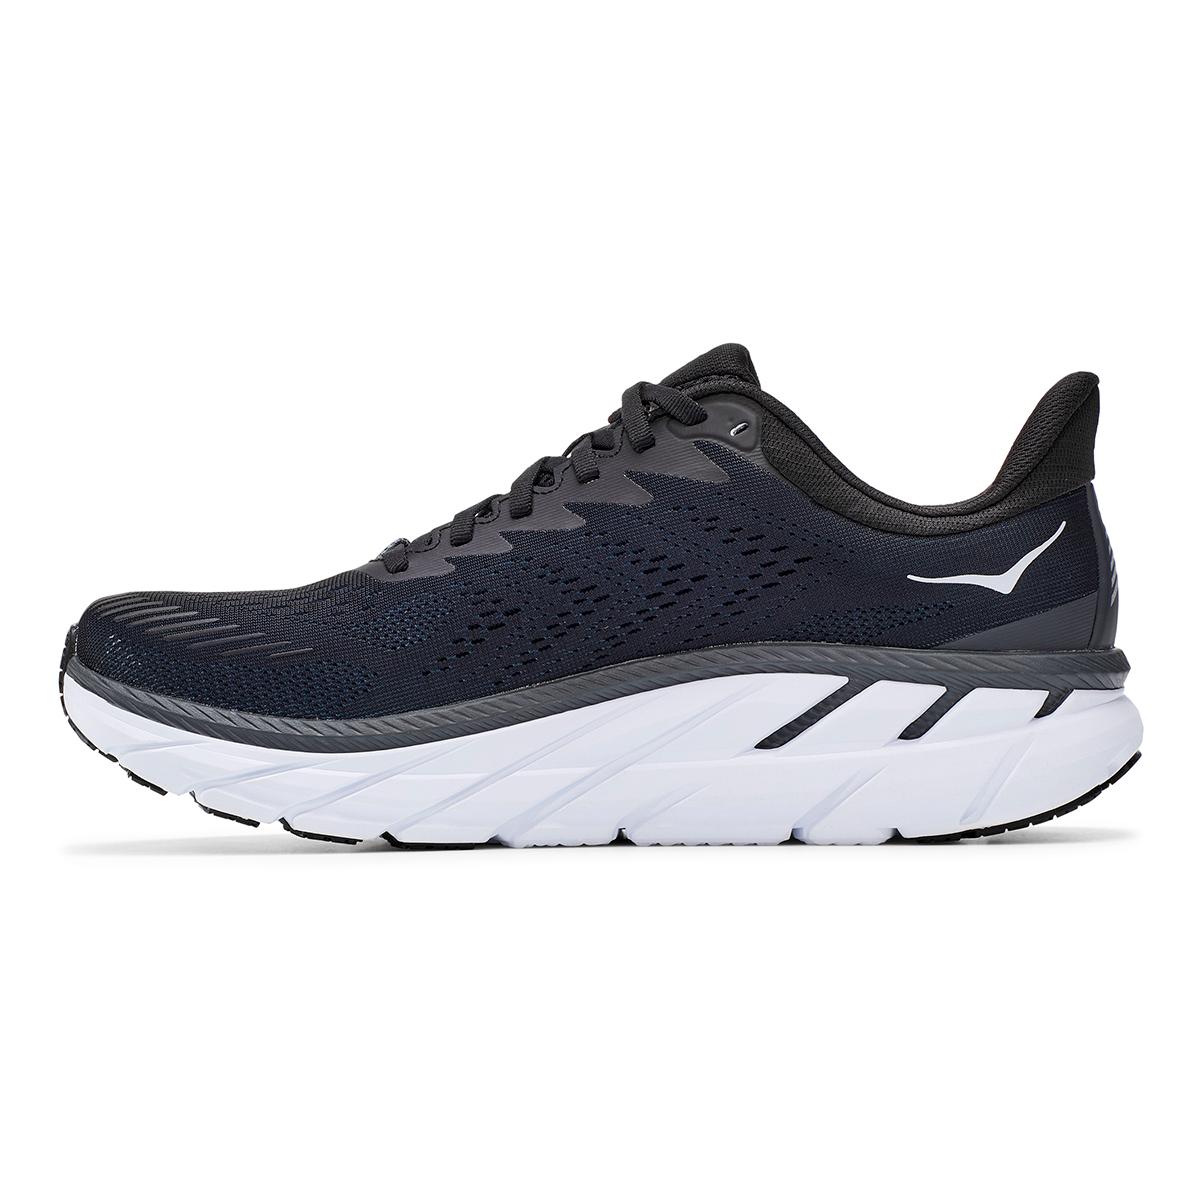 Men's Hoka One One Clifton 7 Running Shoe - Color: Black/White - Size: 7 - Width: Regular, Black/White, large, image 6